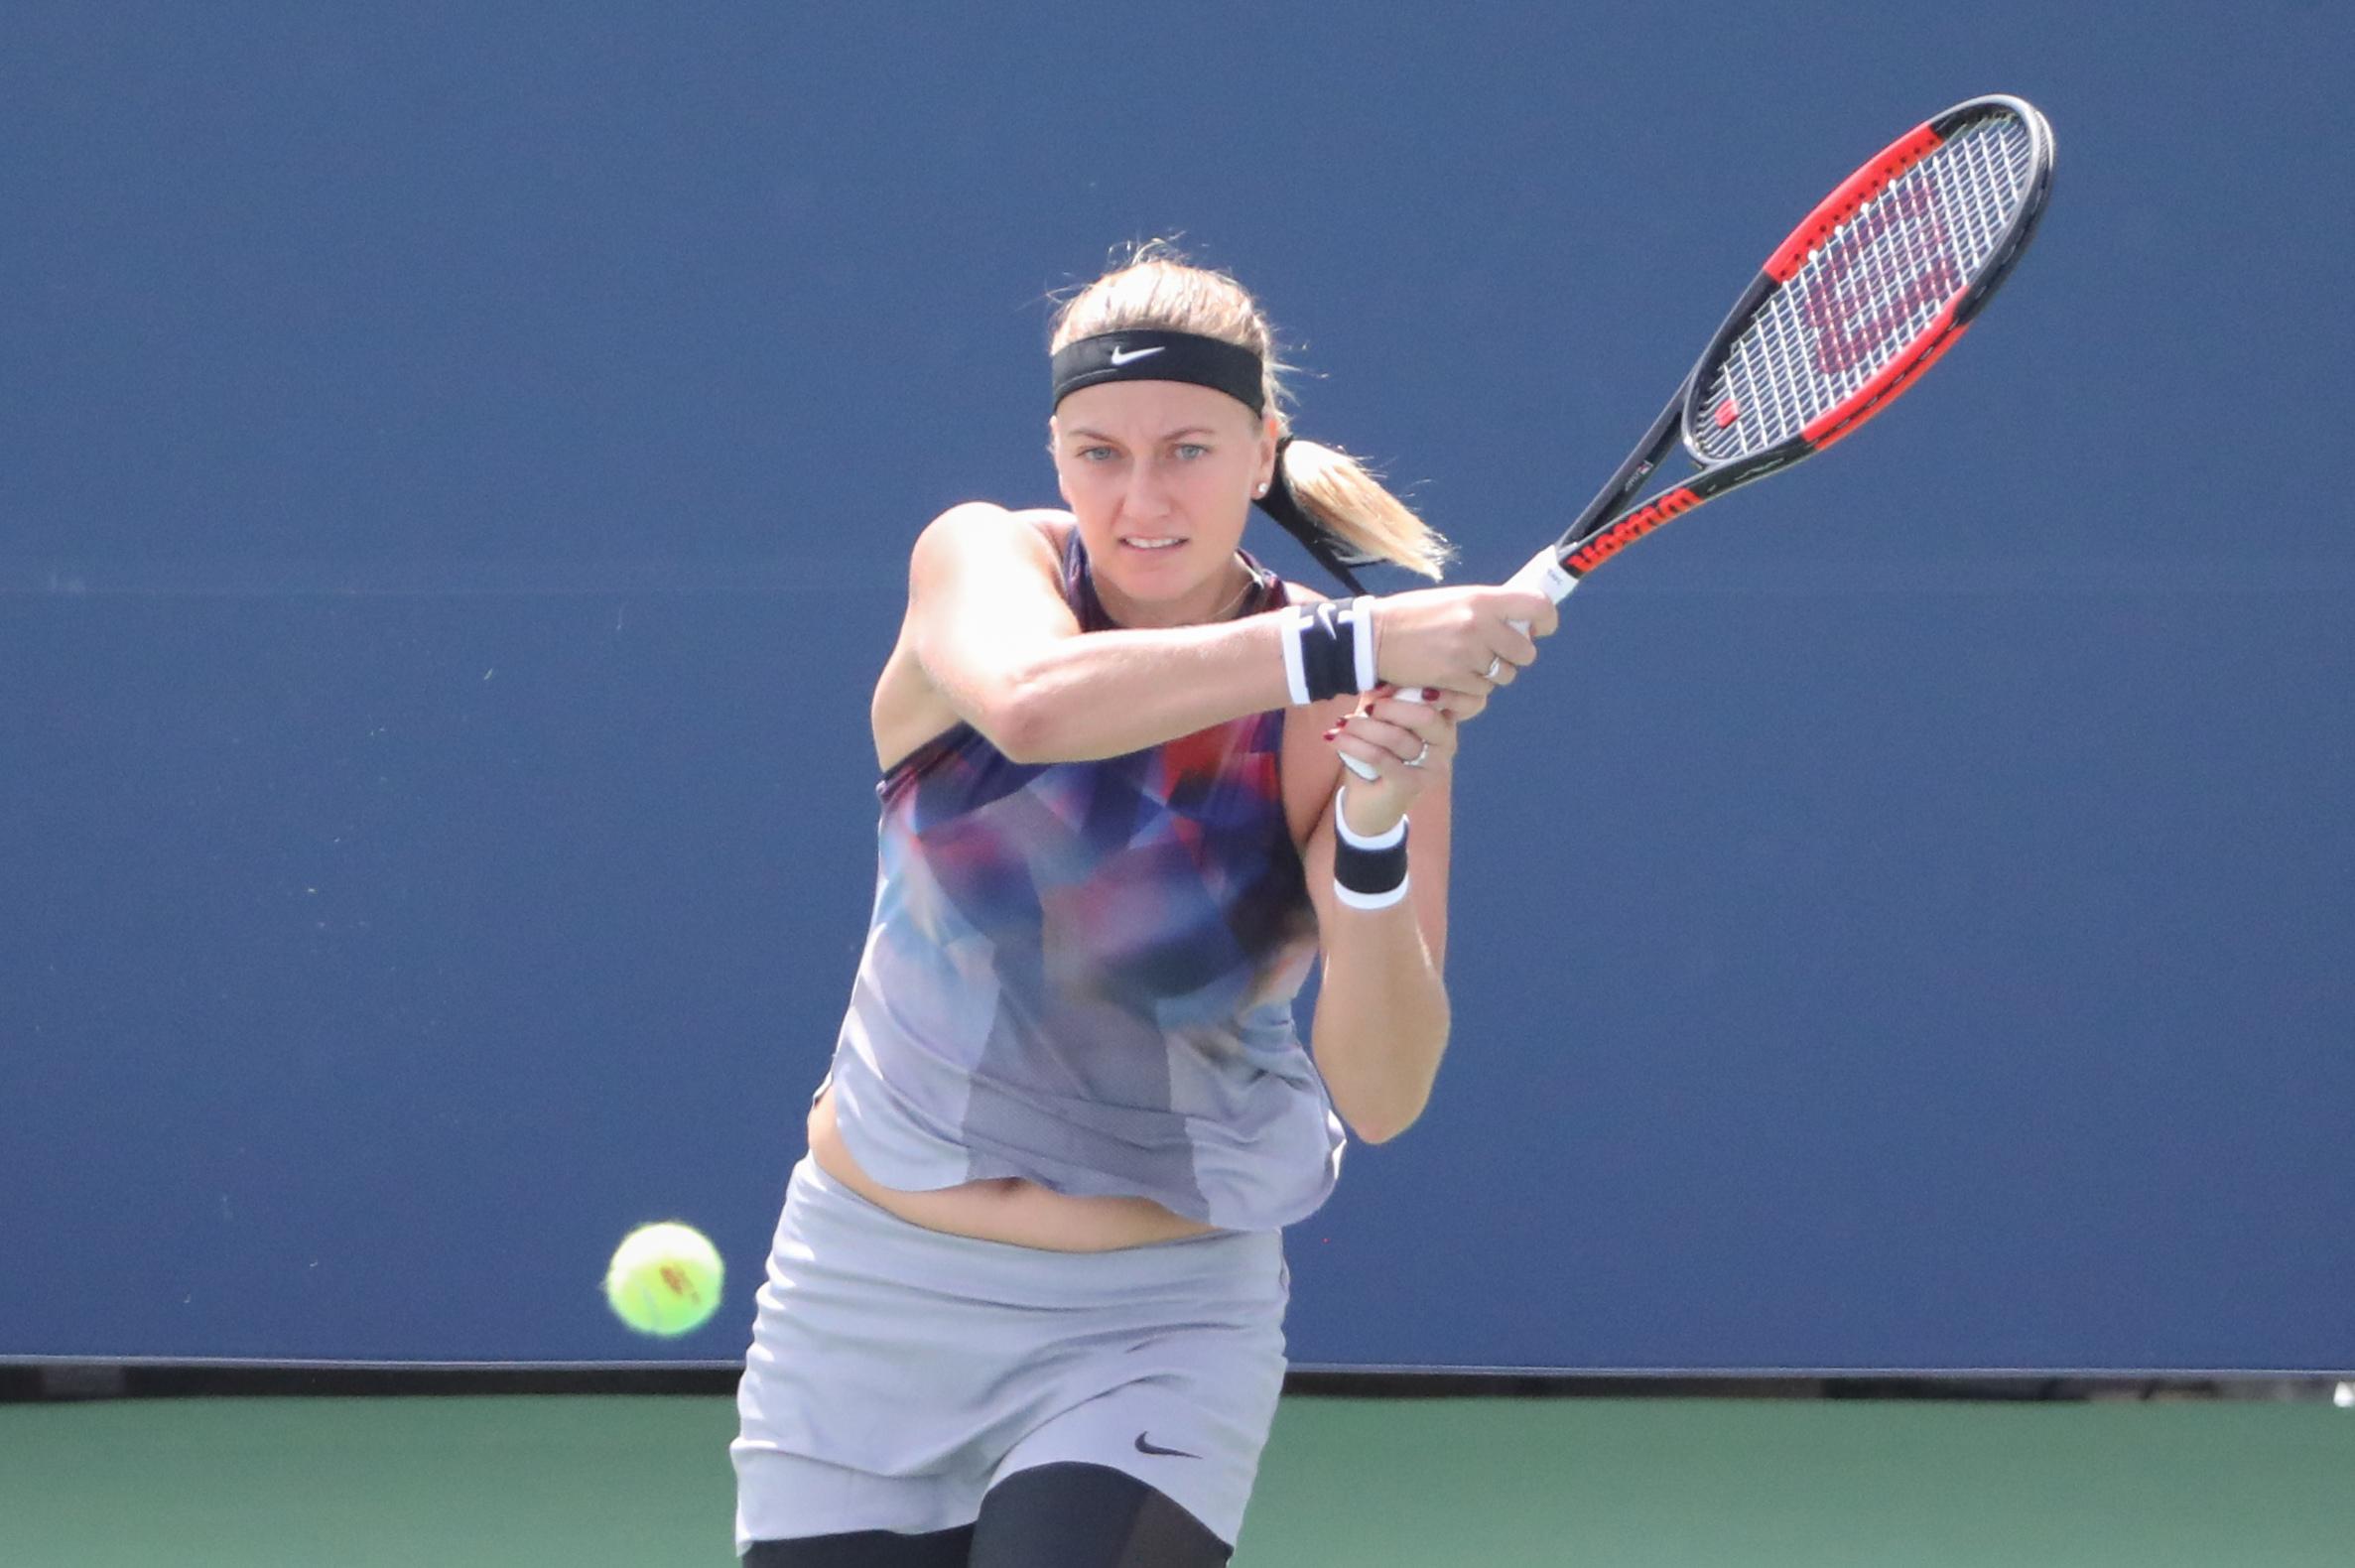 Tennis: Petra Kvitova wears down Jelena Jankovic to reach U.S. Open round two